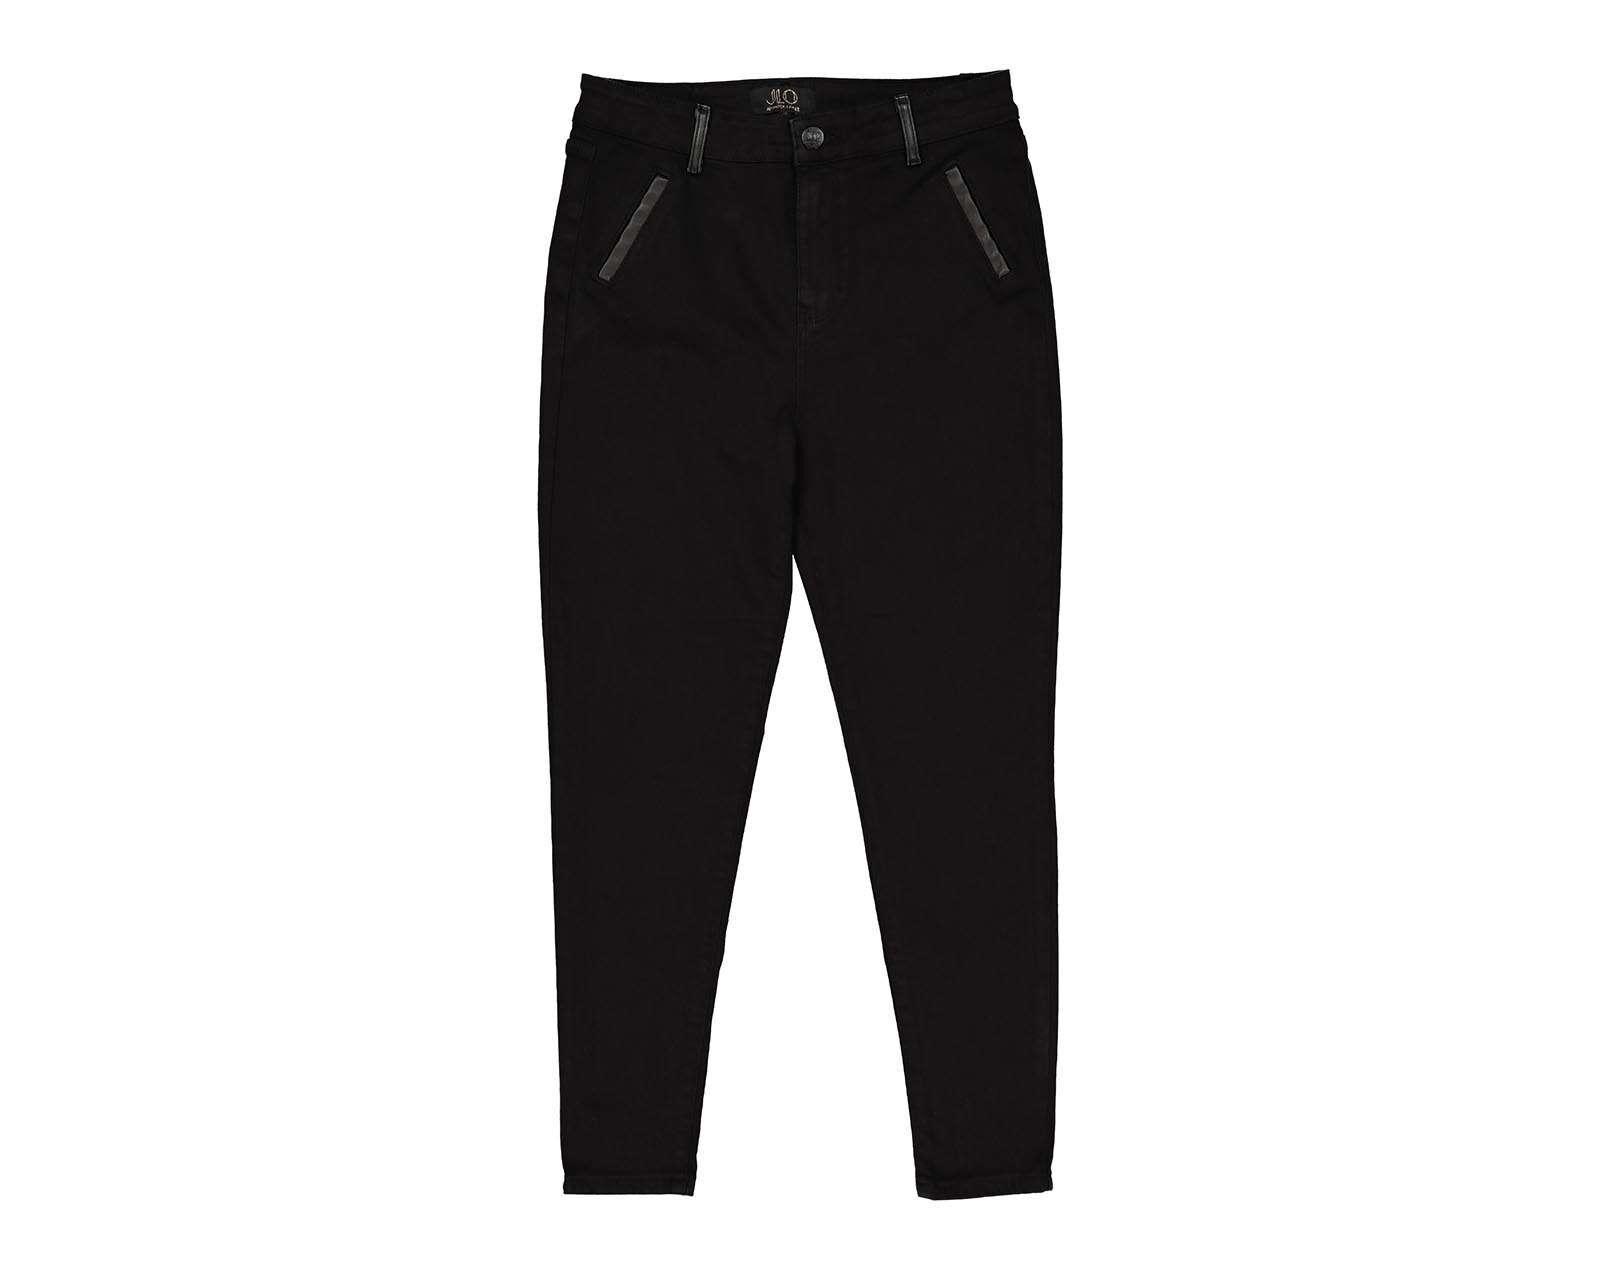 Foto 1|Jeans Jennifer Lopez Skinny